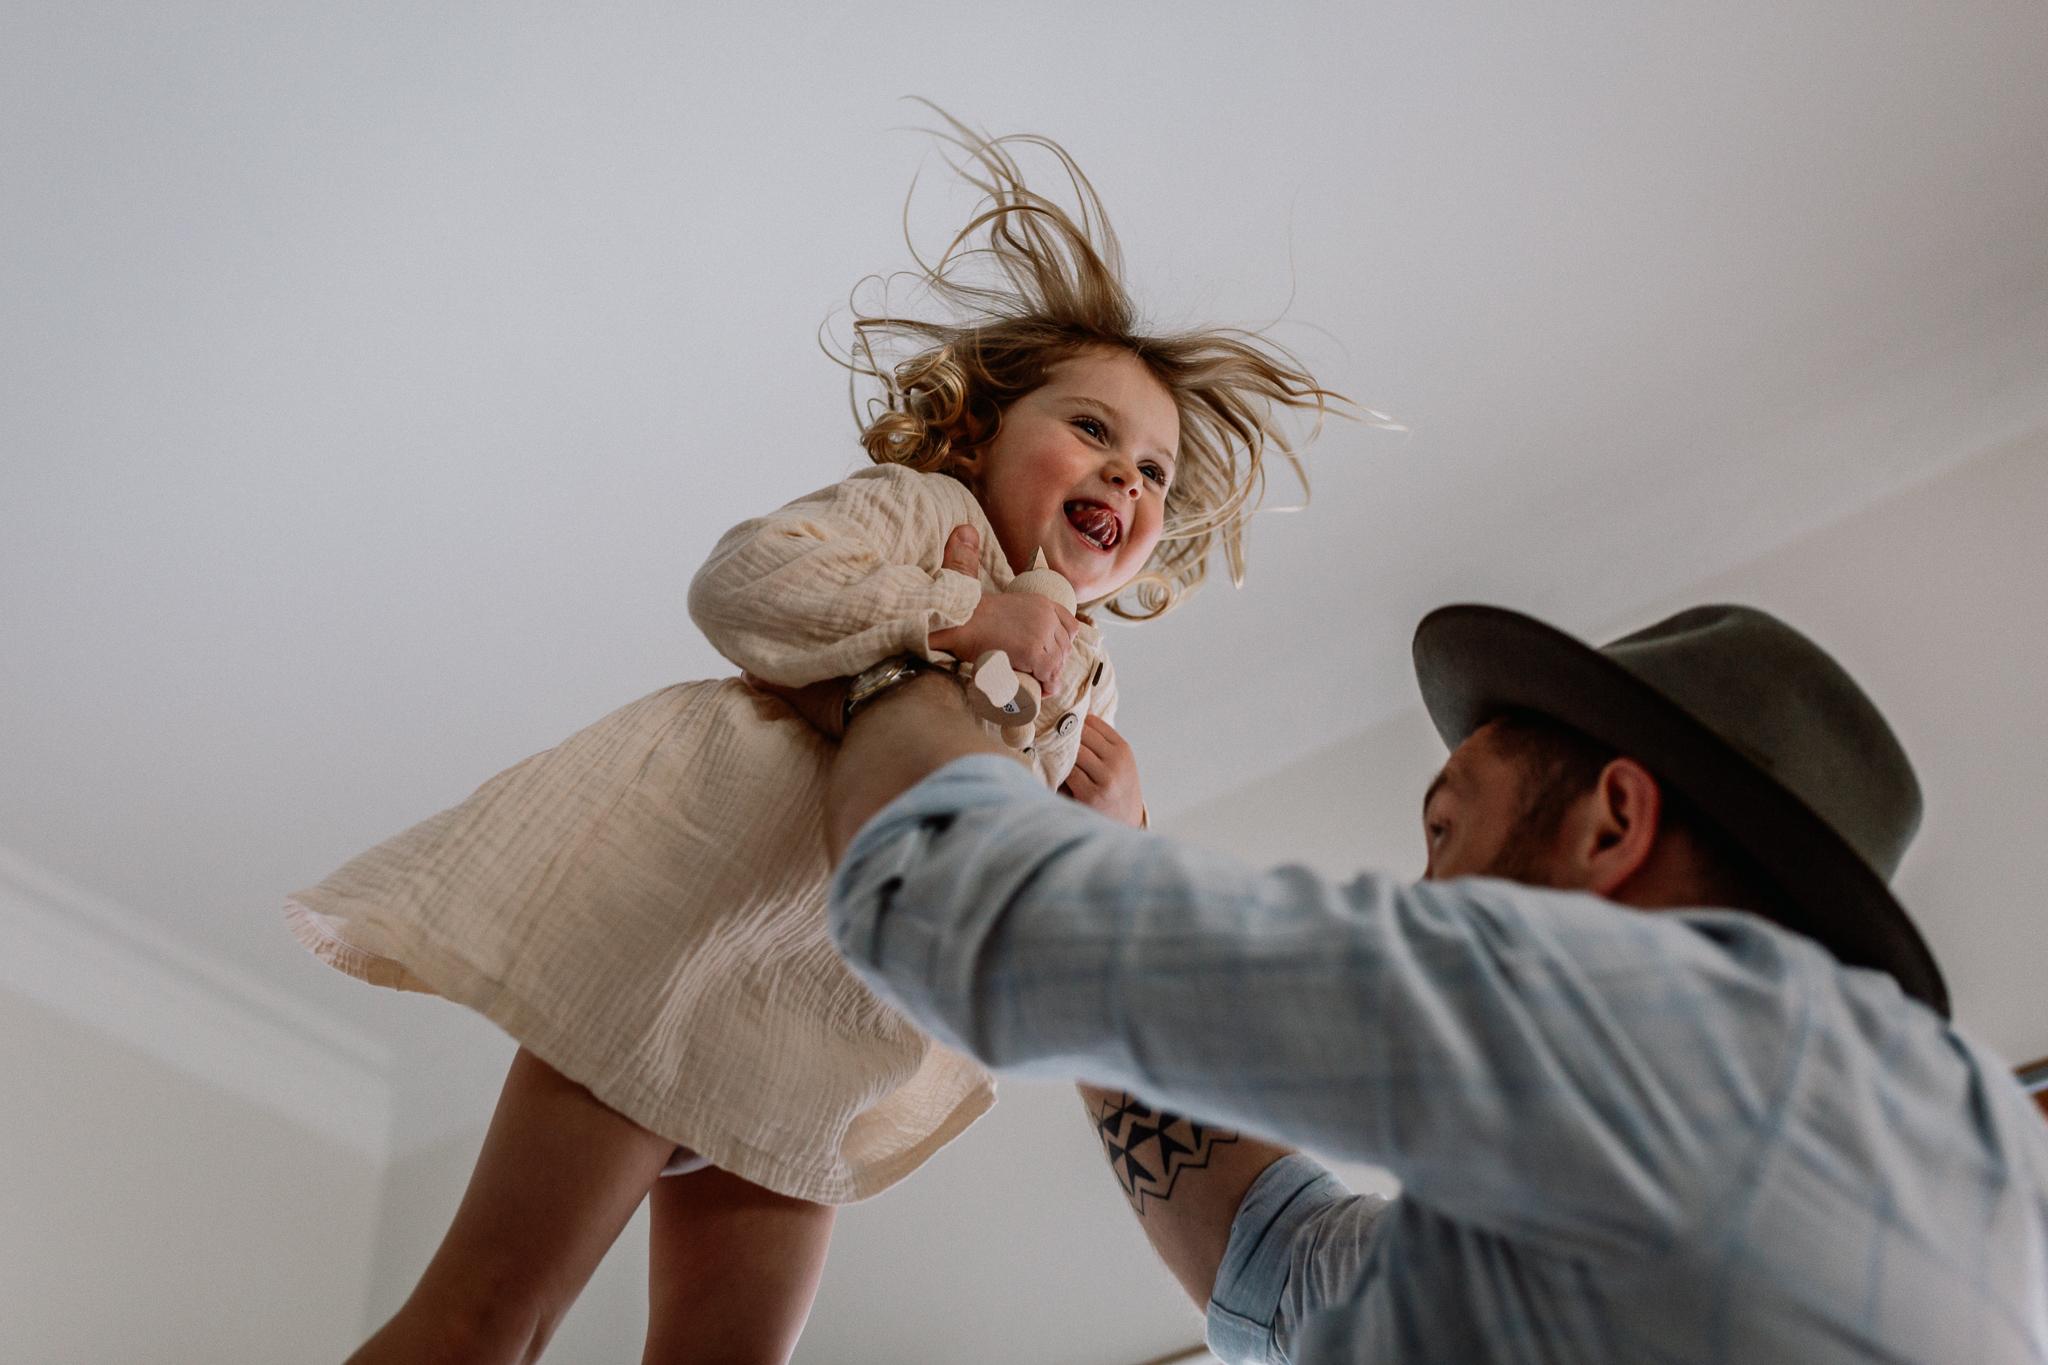 Haweksbury Family Photographer Kylie Purtell-7.jpg